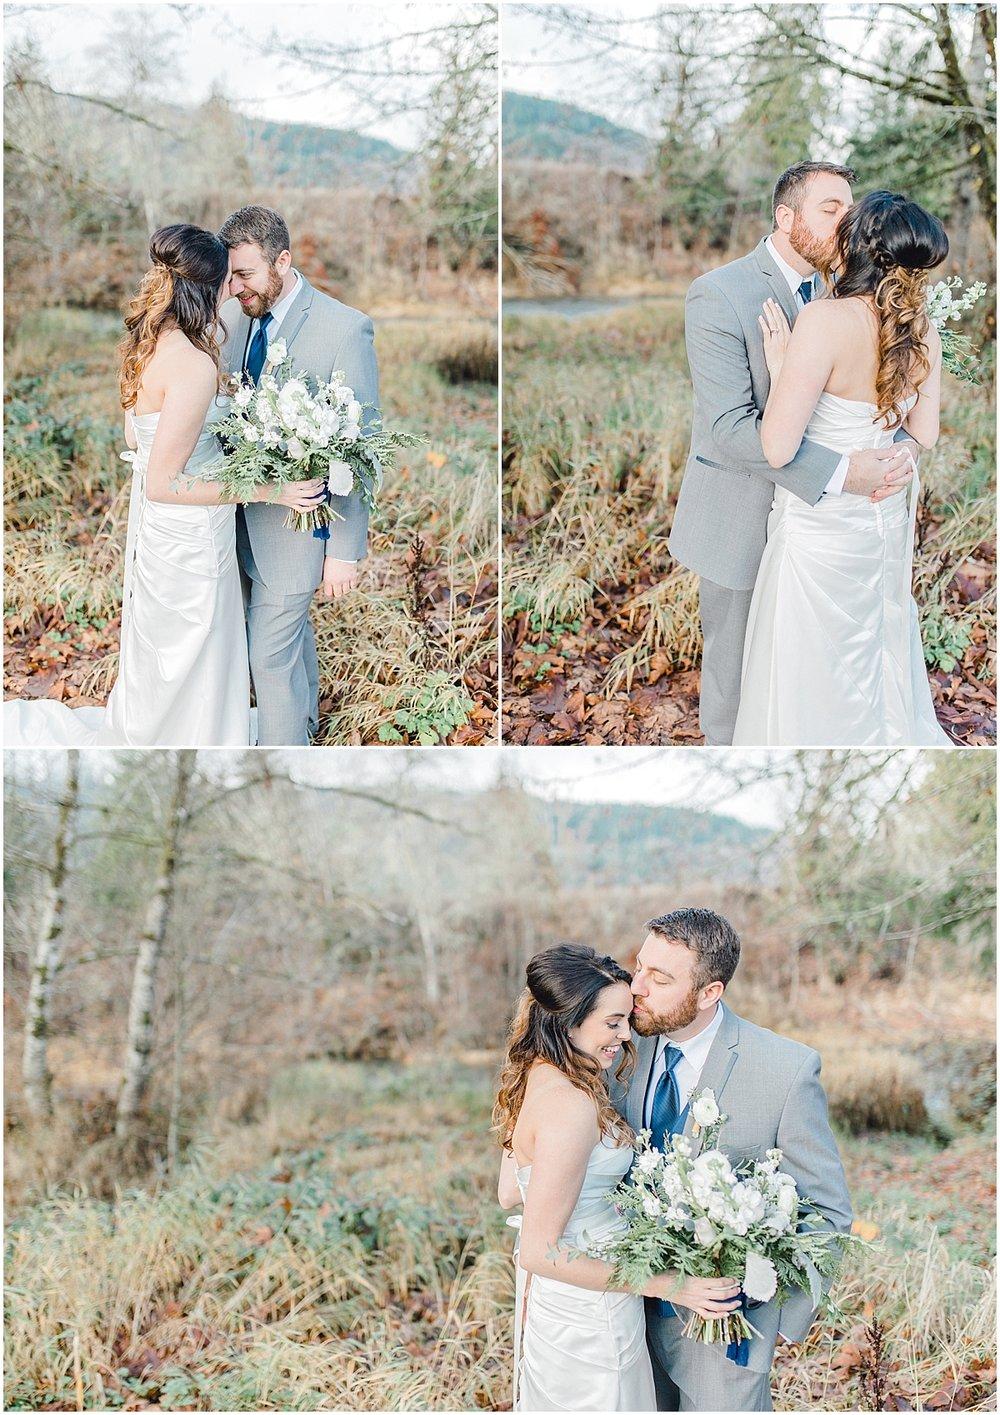 Chehalis Washington Winter Wedding Silver and White | Willapa Hills Farm Wedding | Eastham | Emma Rose Company PNW Light and Airy Wedding Photographer_0023.jpg